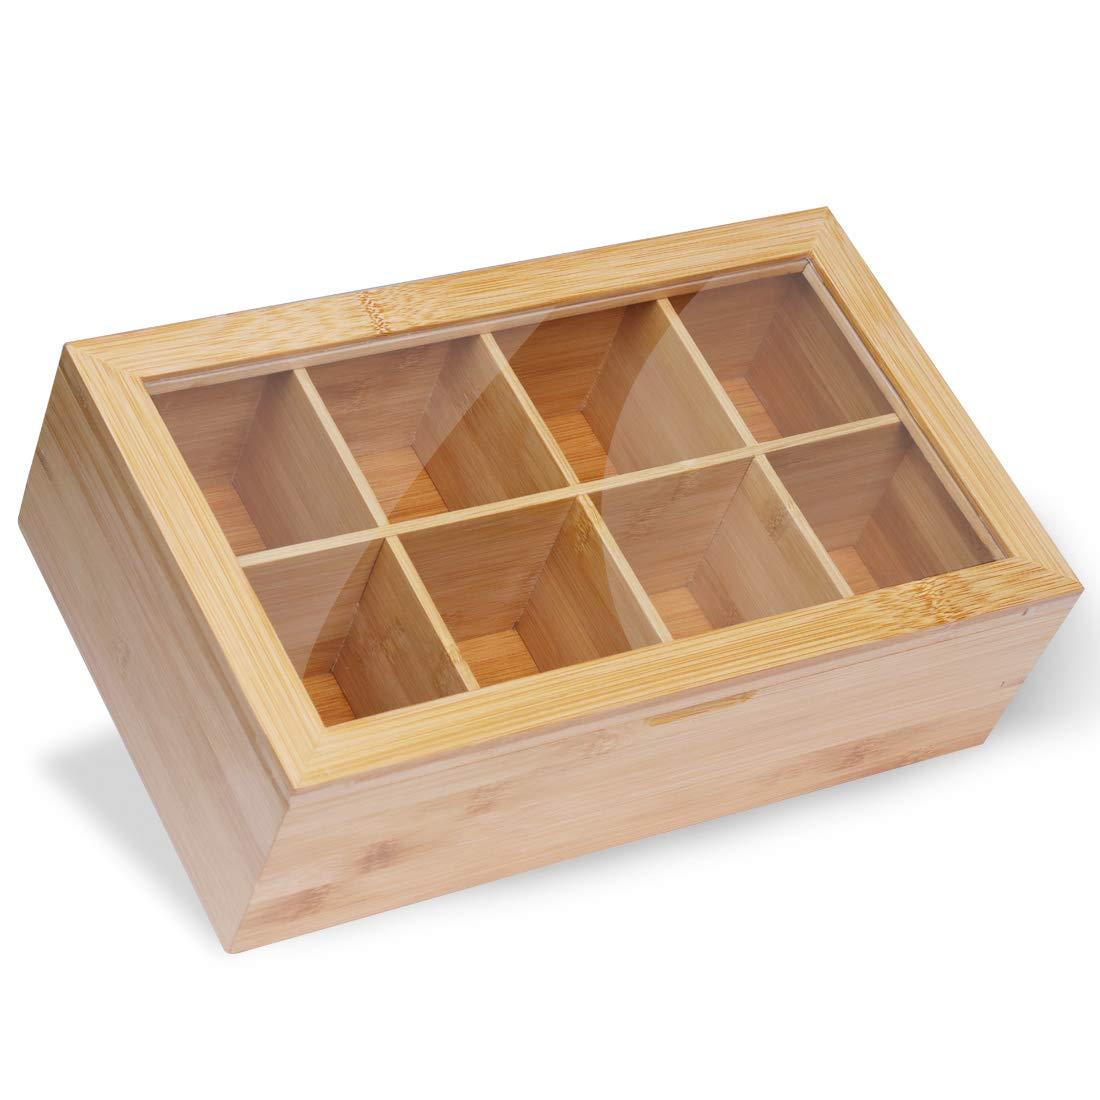 Ecbanli Bamboo Tea Box, Tea Bag Organizer with 8 Deeper Compartments, Natural Wooden Finish by ECBANLI